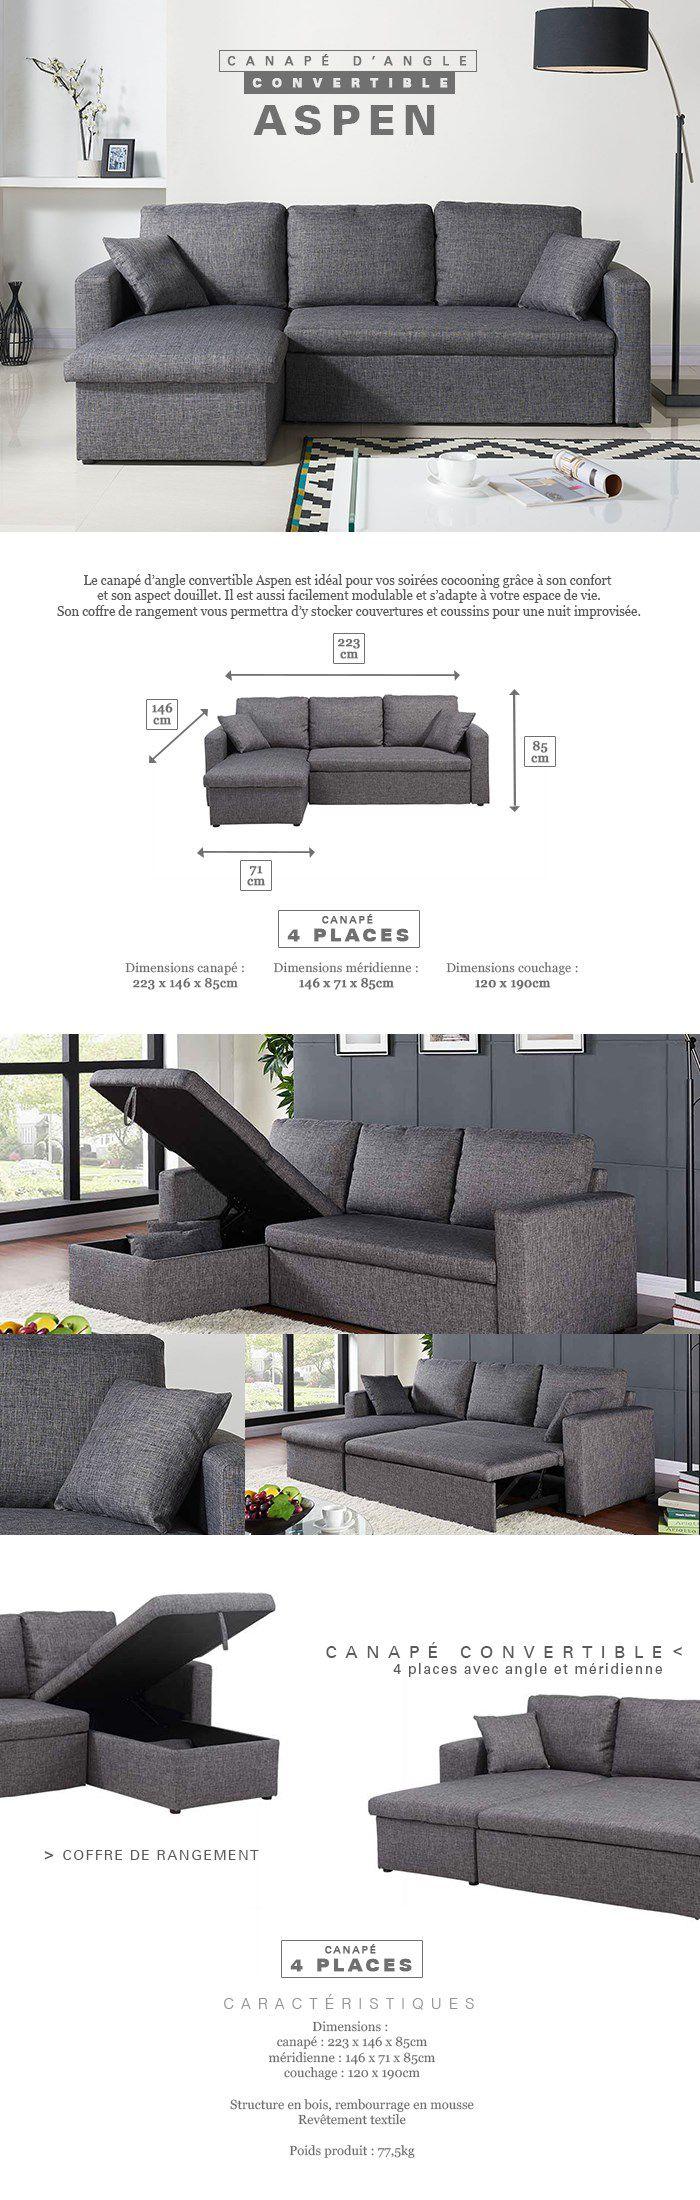 aspen canap d 39 angle r versible convertible 4 places tissu gris chin contemporain l 223 x. Black Bedroom Furniture Sets. Home Design Ideas